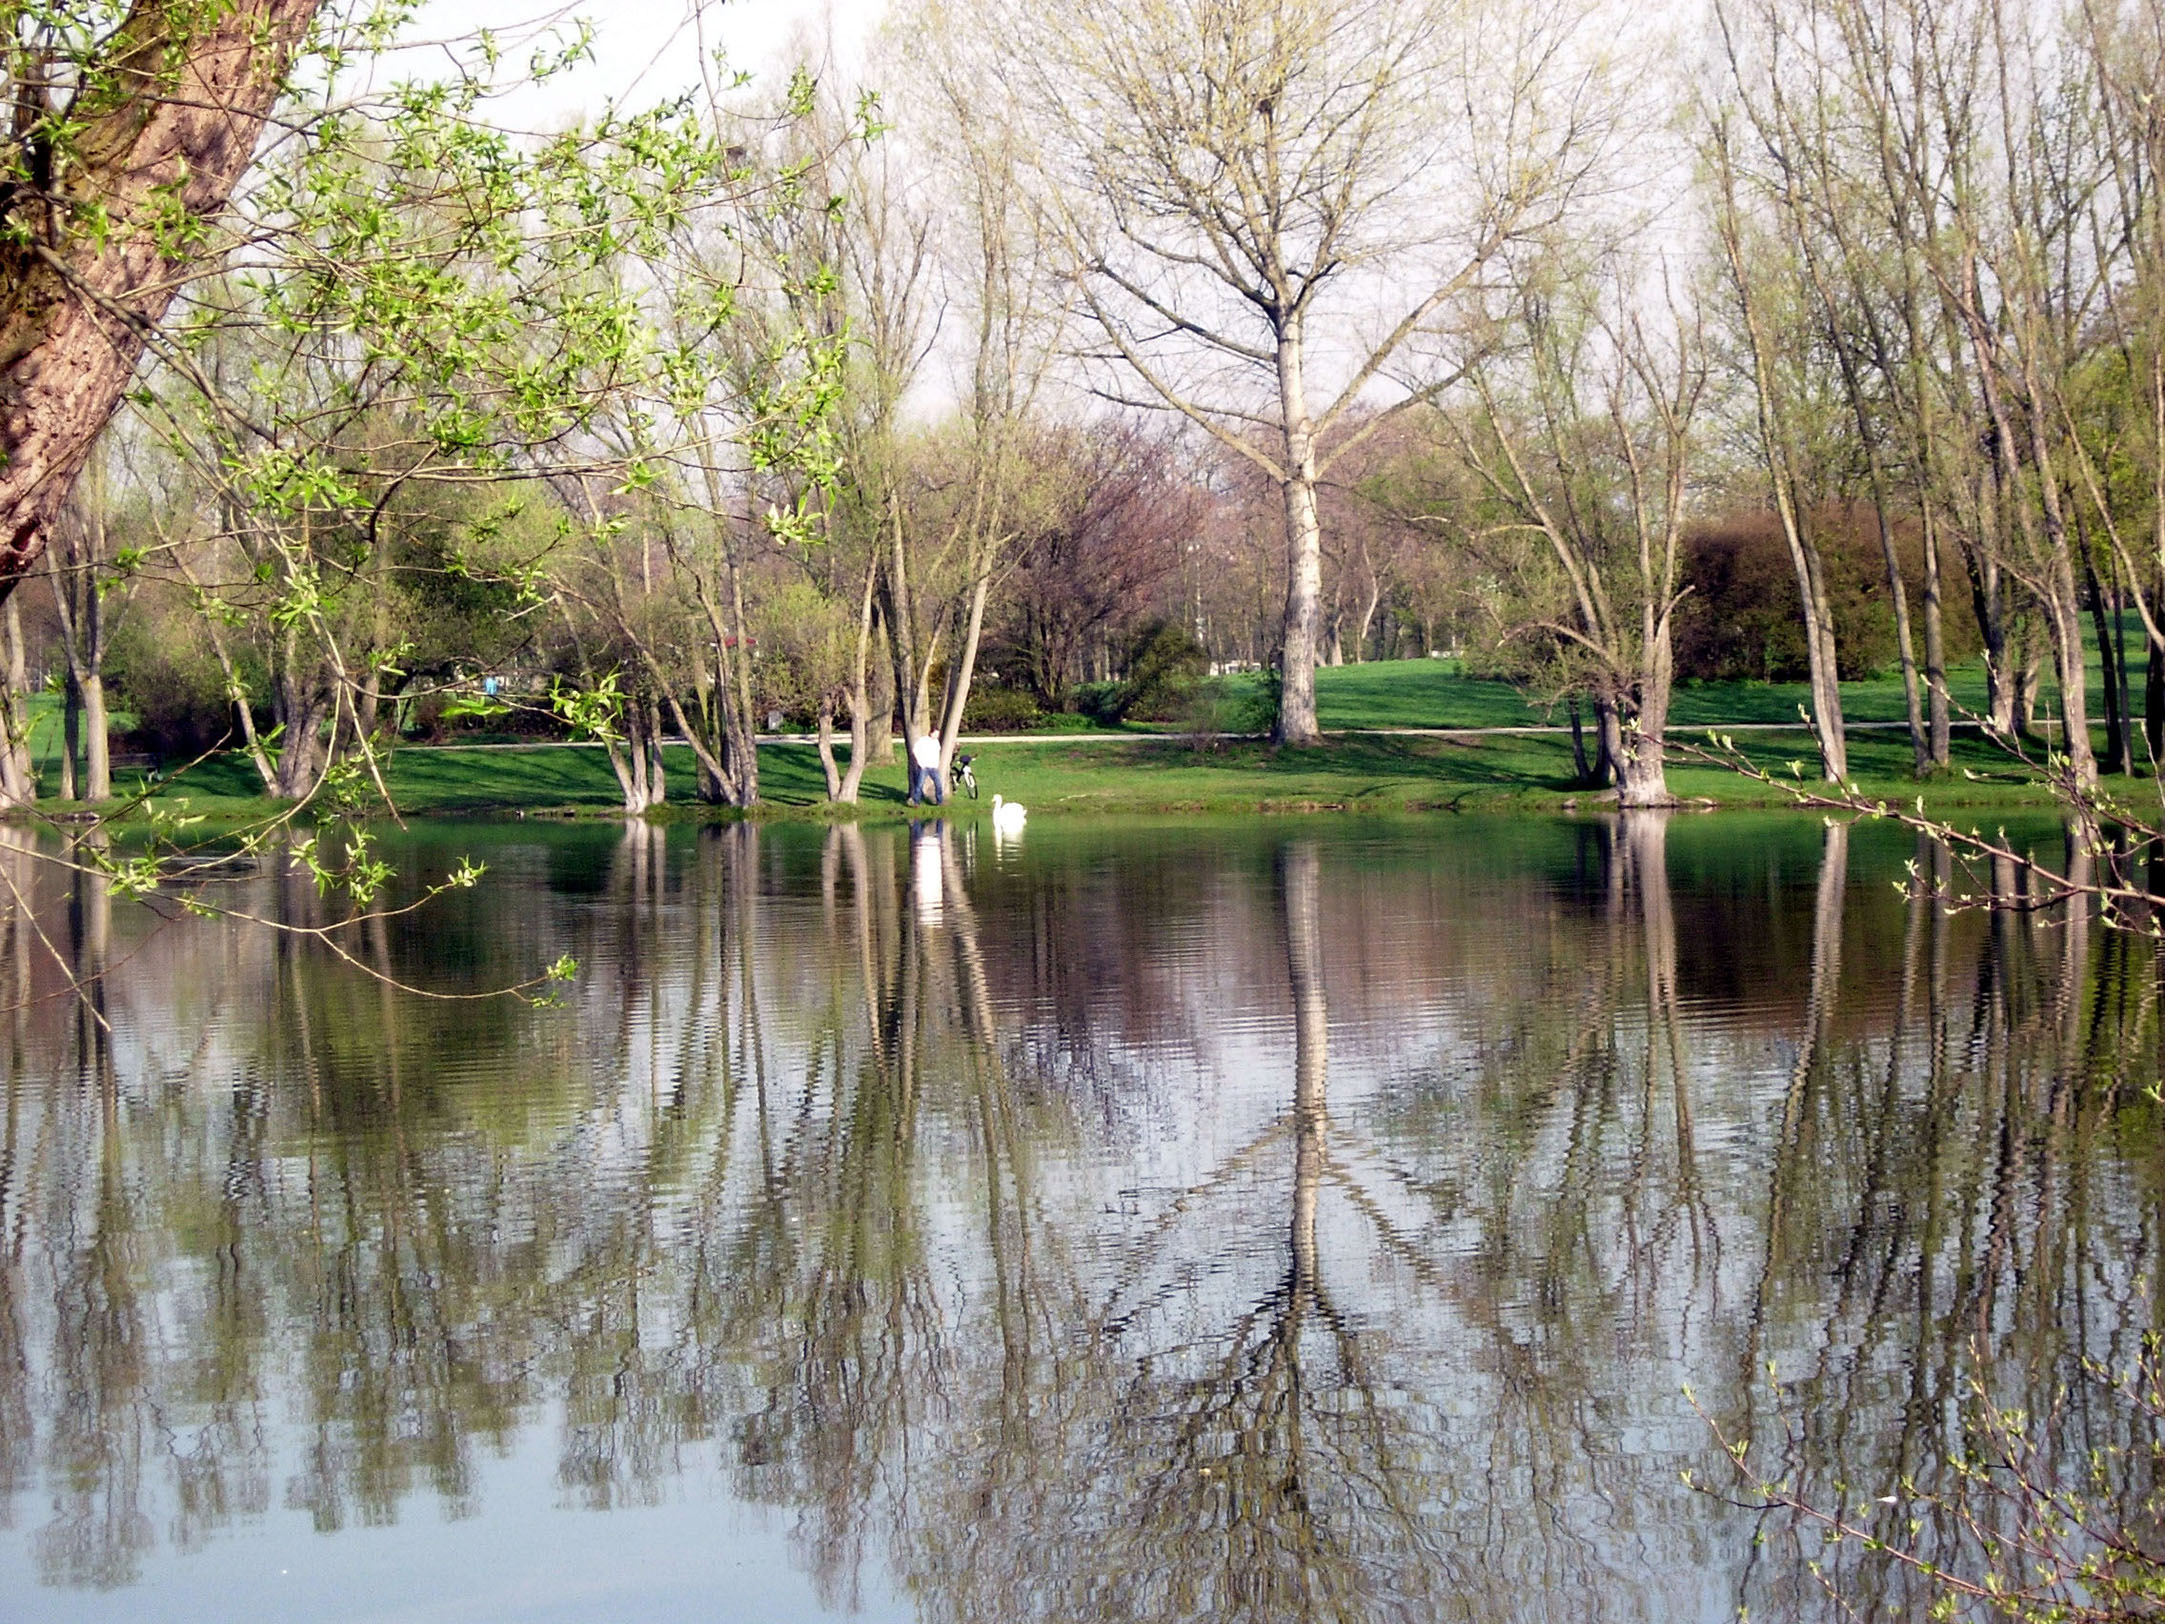 Rebstockweiher im Frühling